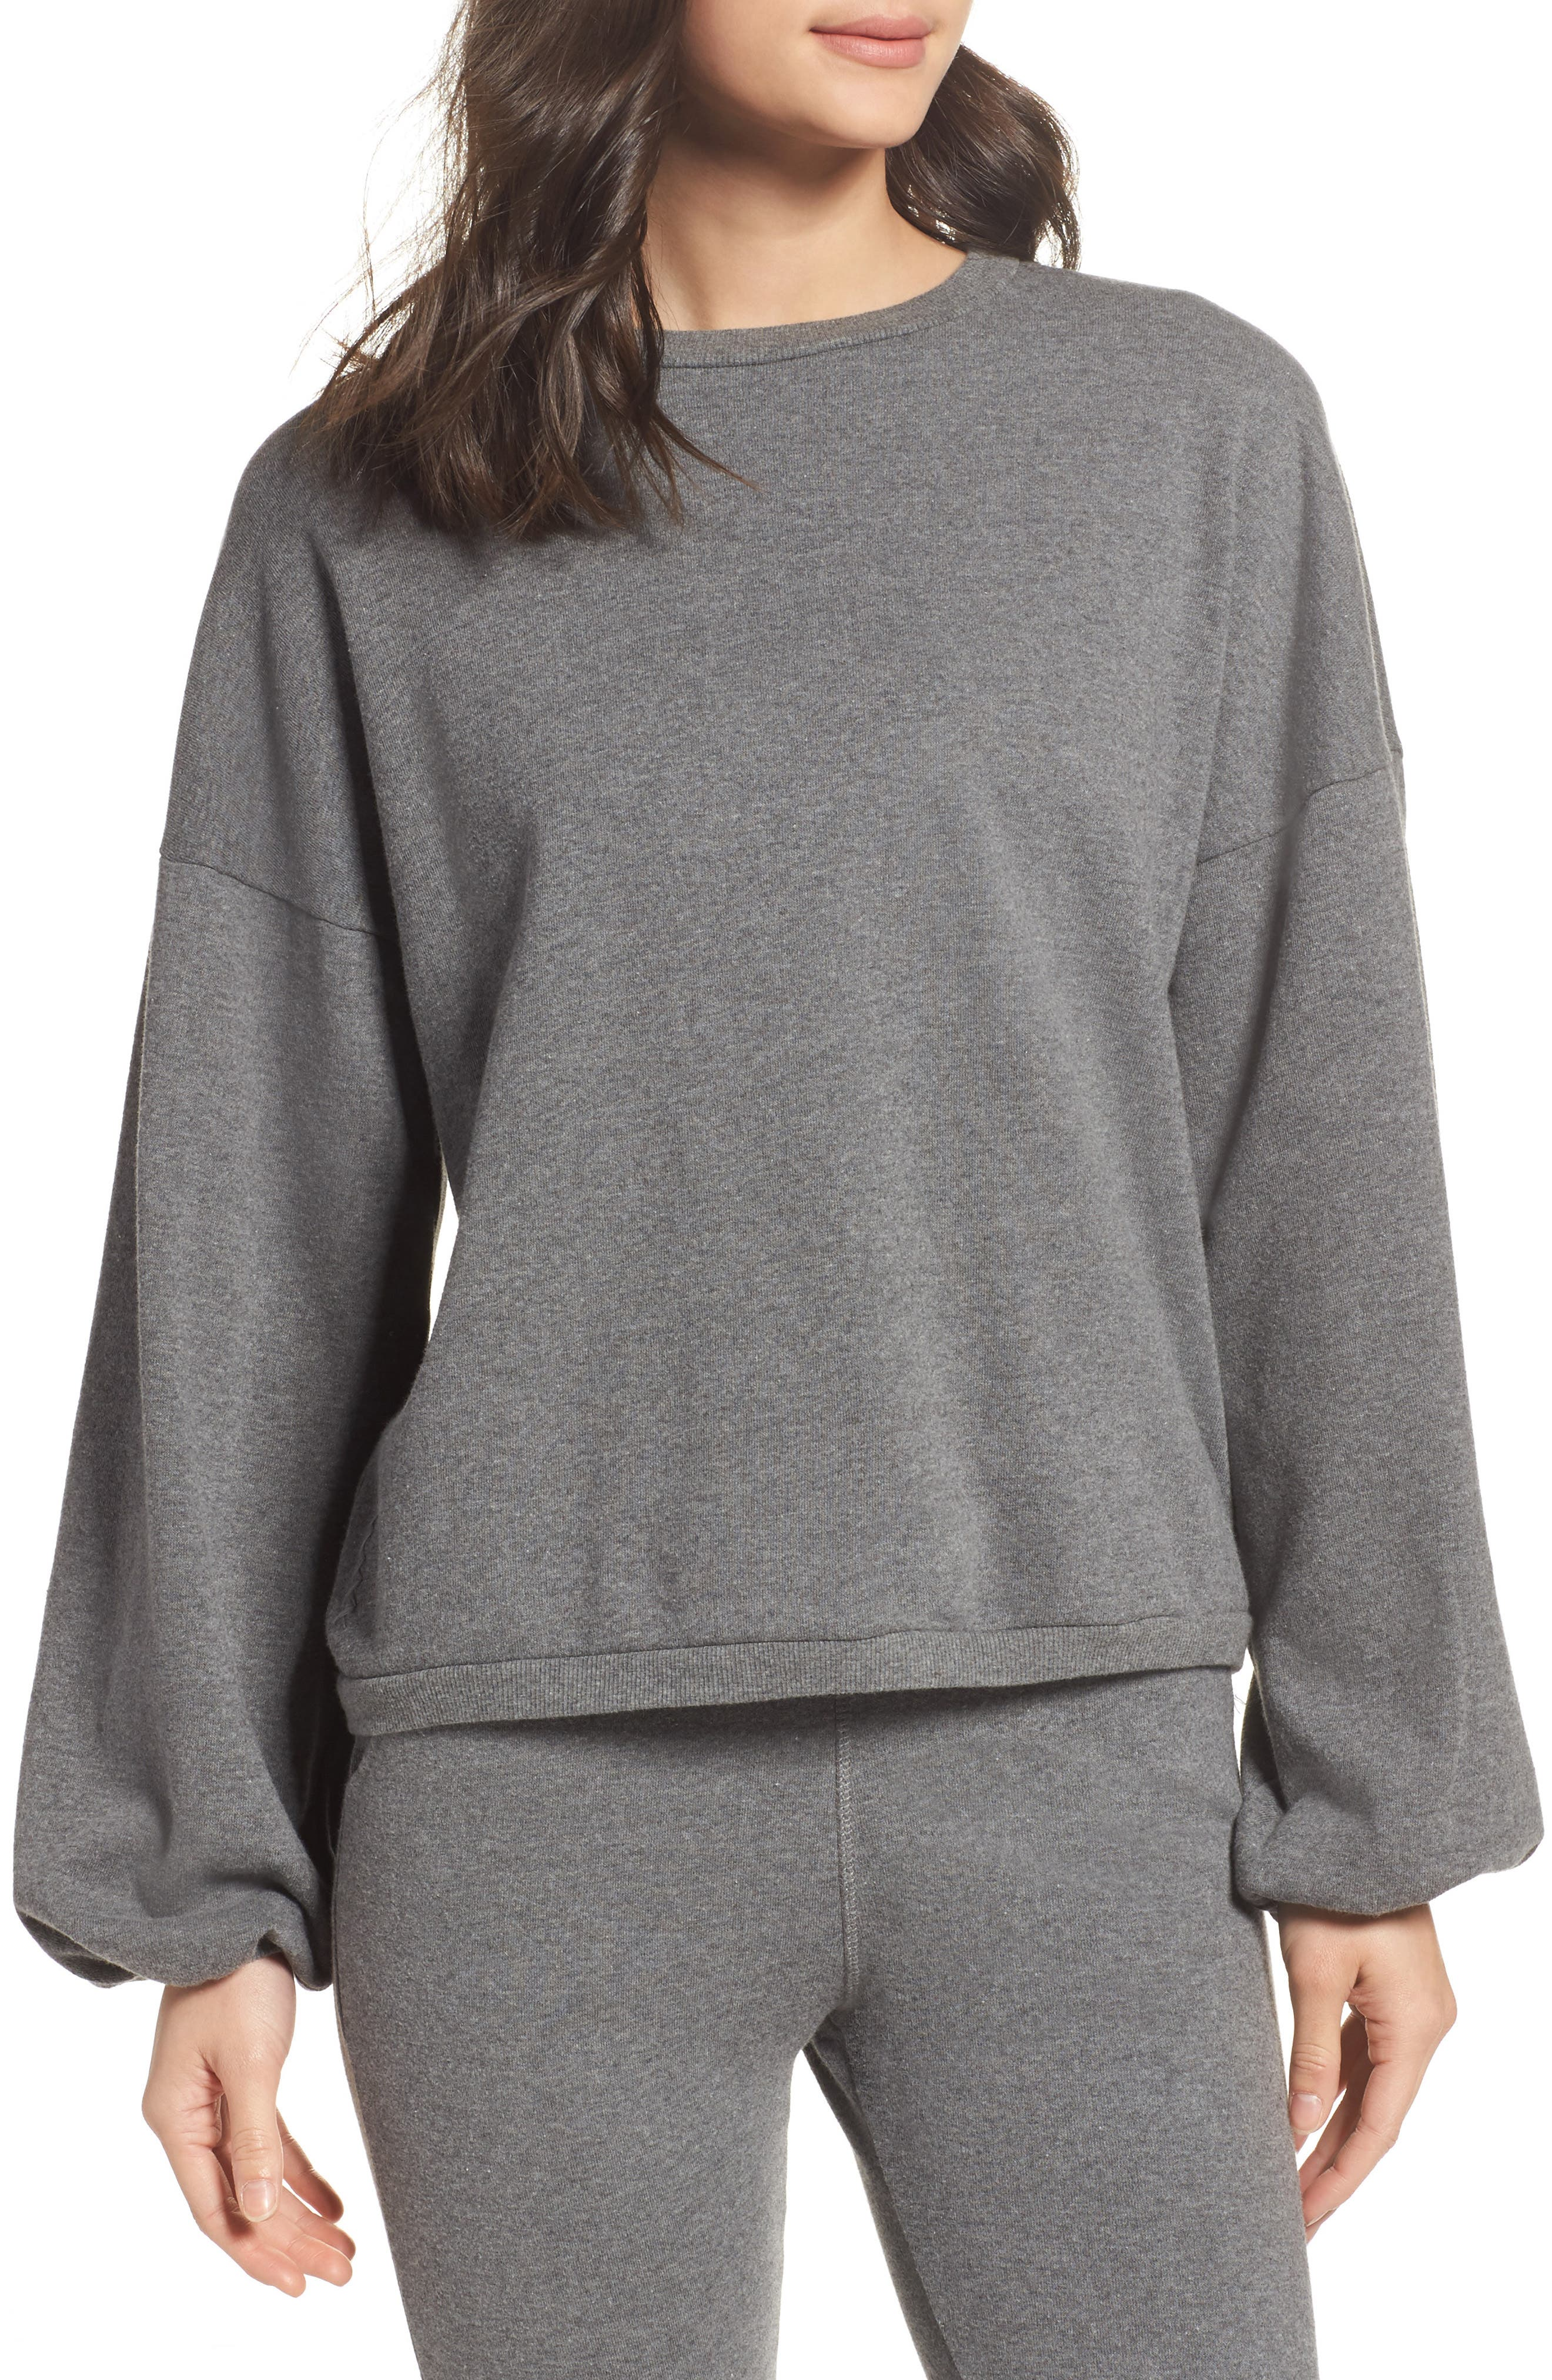 Puff Sleeve Sweatshirt,                             Main thumbnail 1, color,                             020